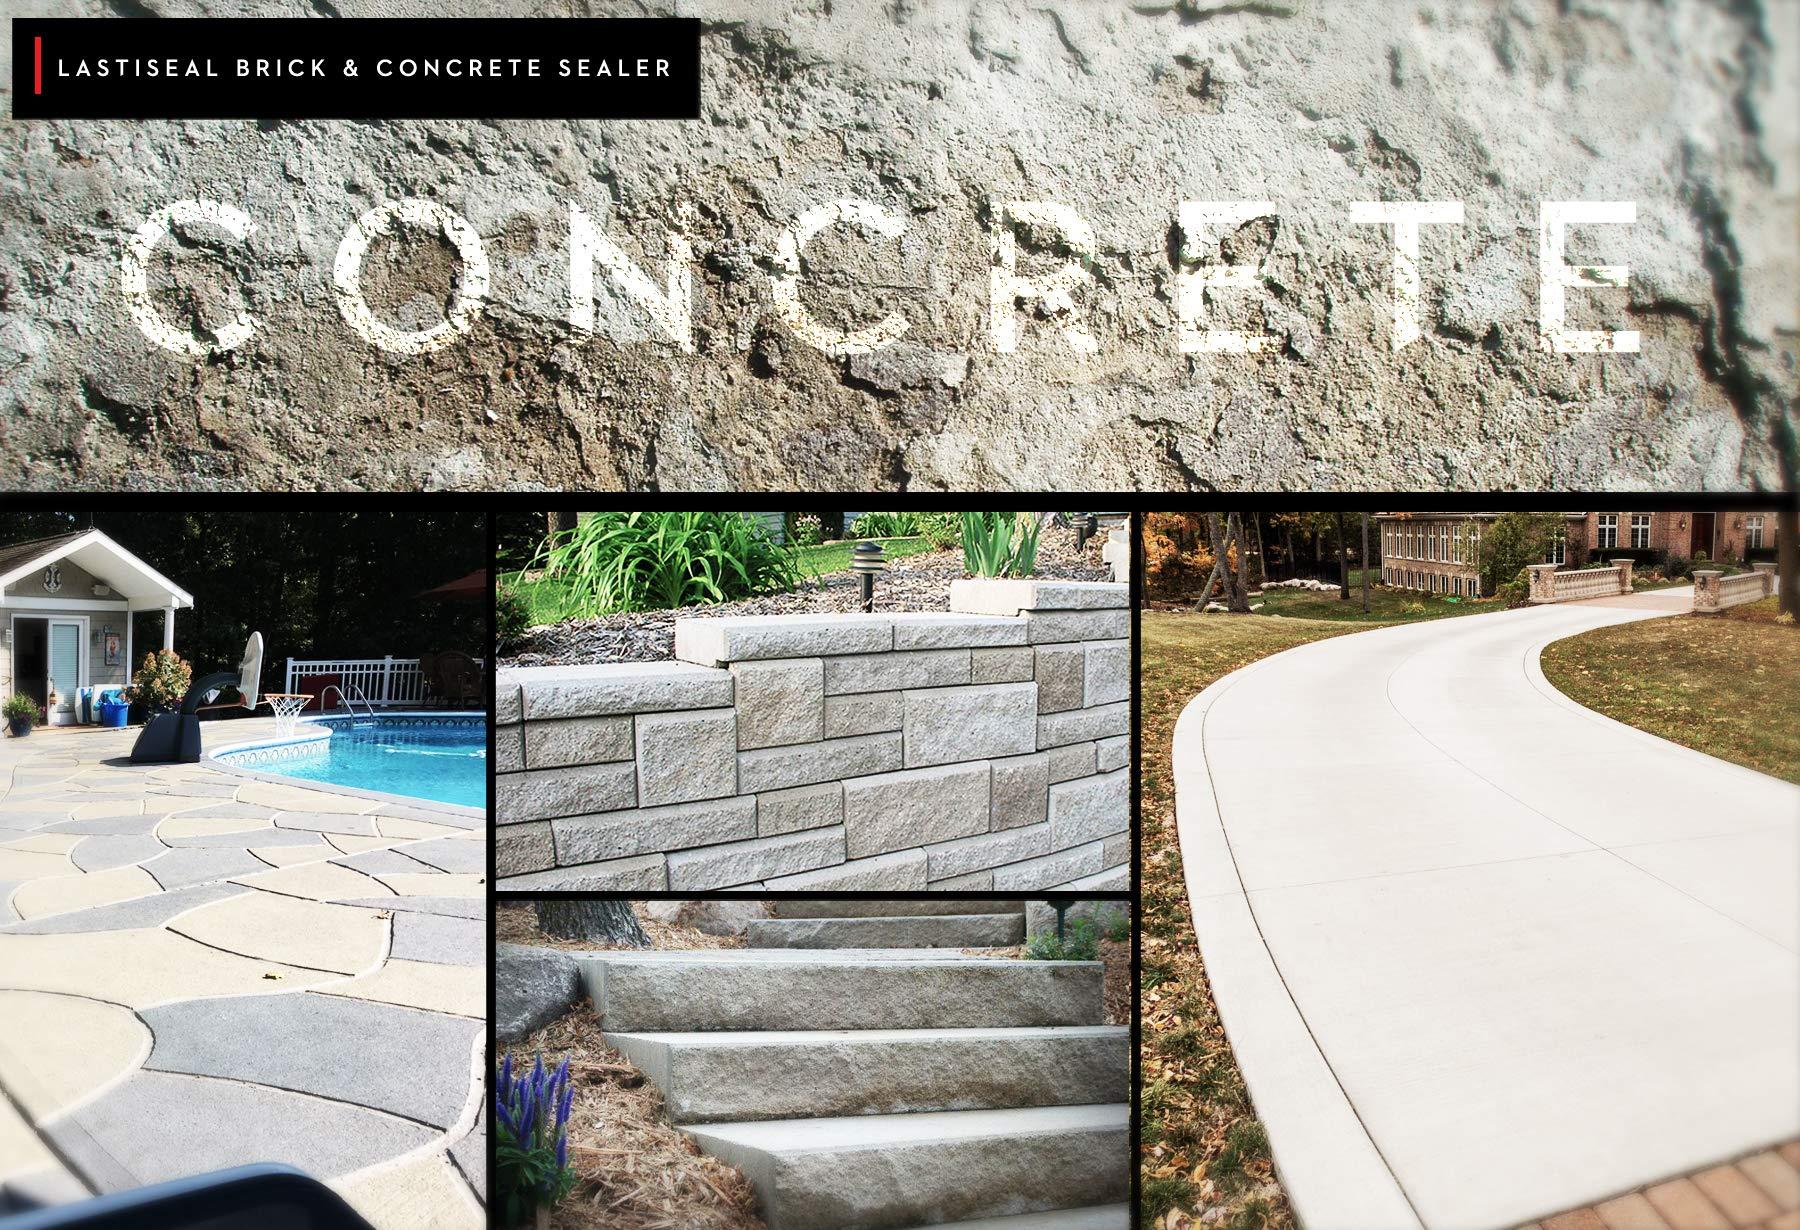 LastiSeal Brick & Concrete Sealer - SATIN Finish (5-gal) | All Purpose Sealer for Brick, Concrete, Stone, Porous Masonry | 15-Year Waterproofing Warranty | Low Gloss Sheen by RadonSeal (Image #3)